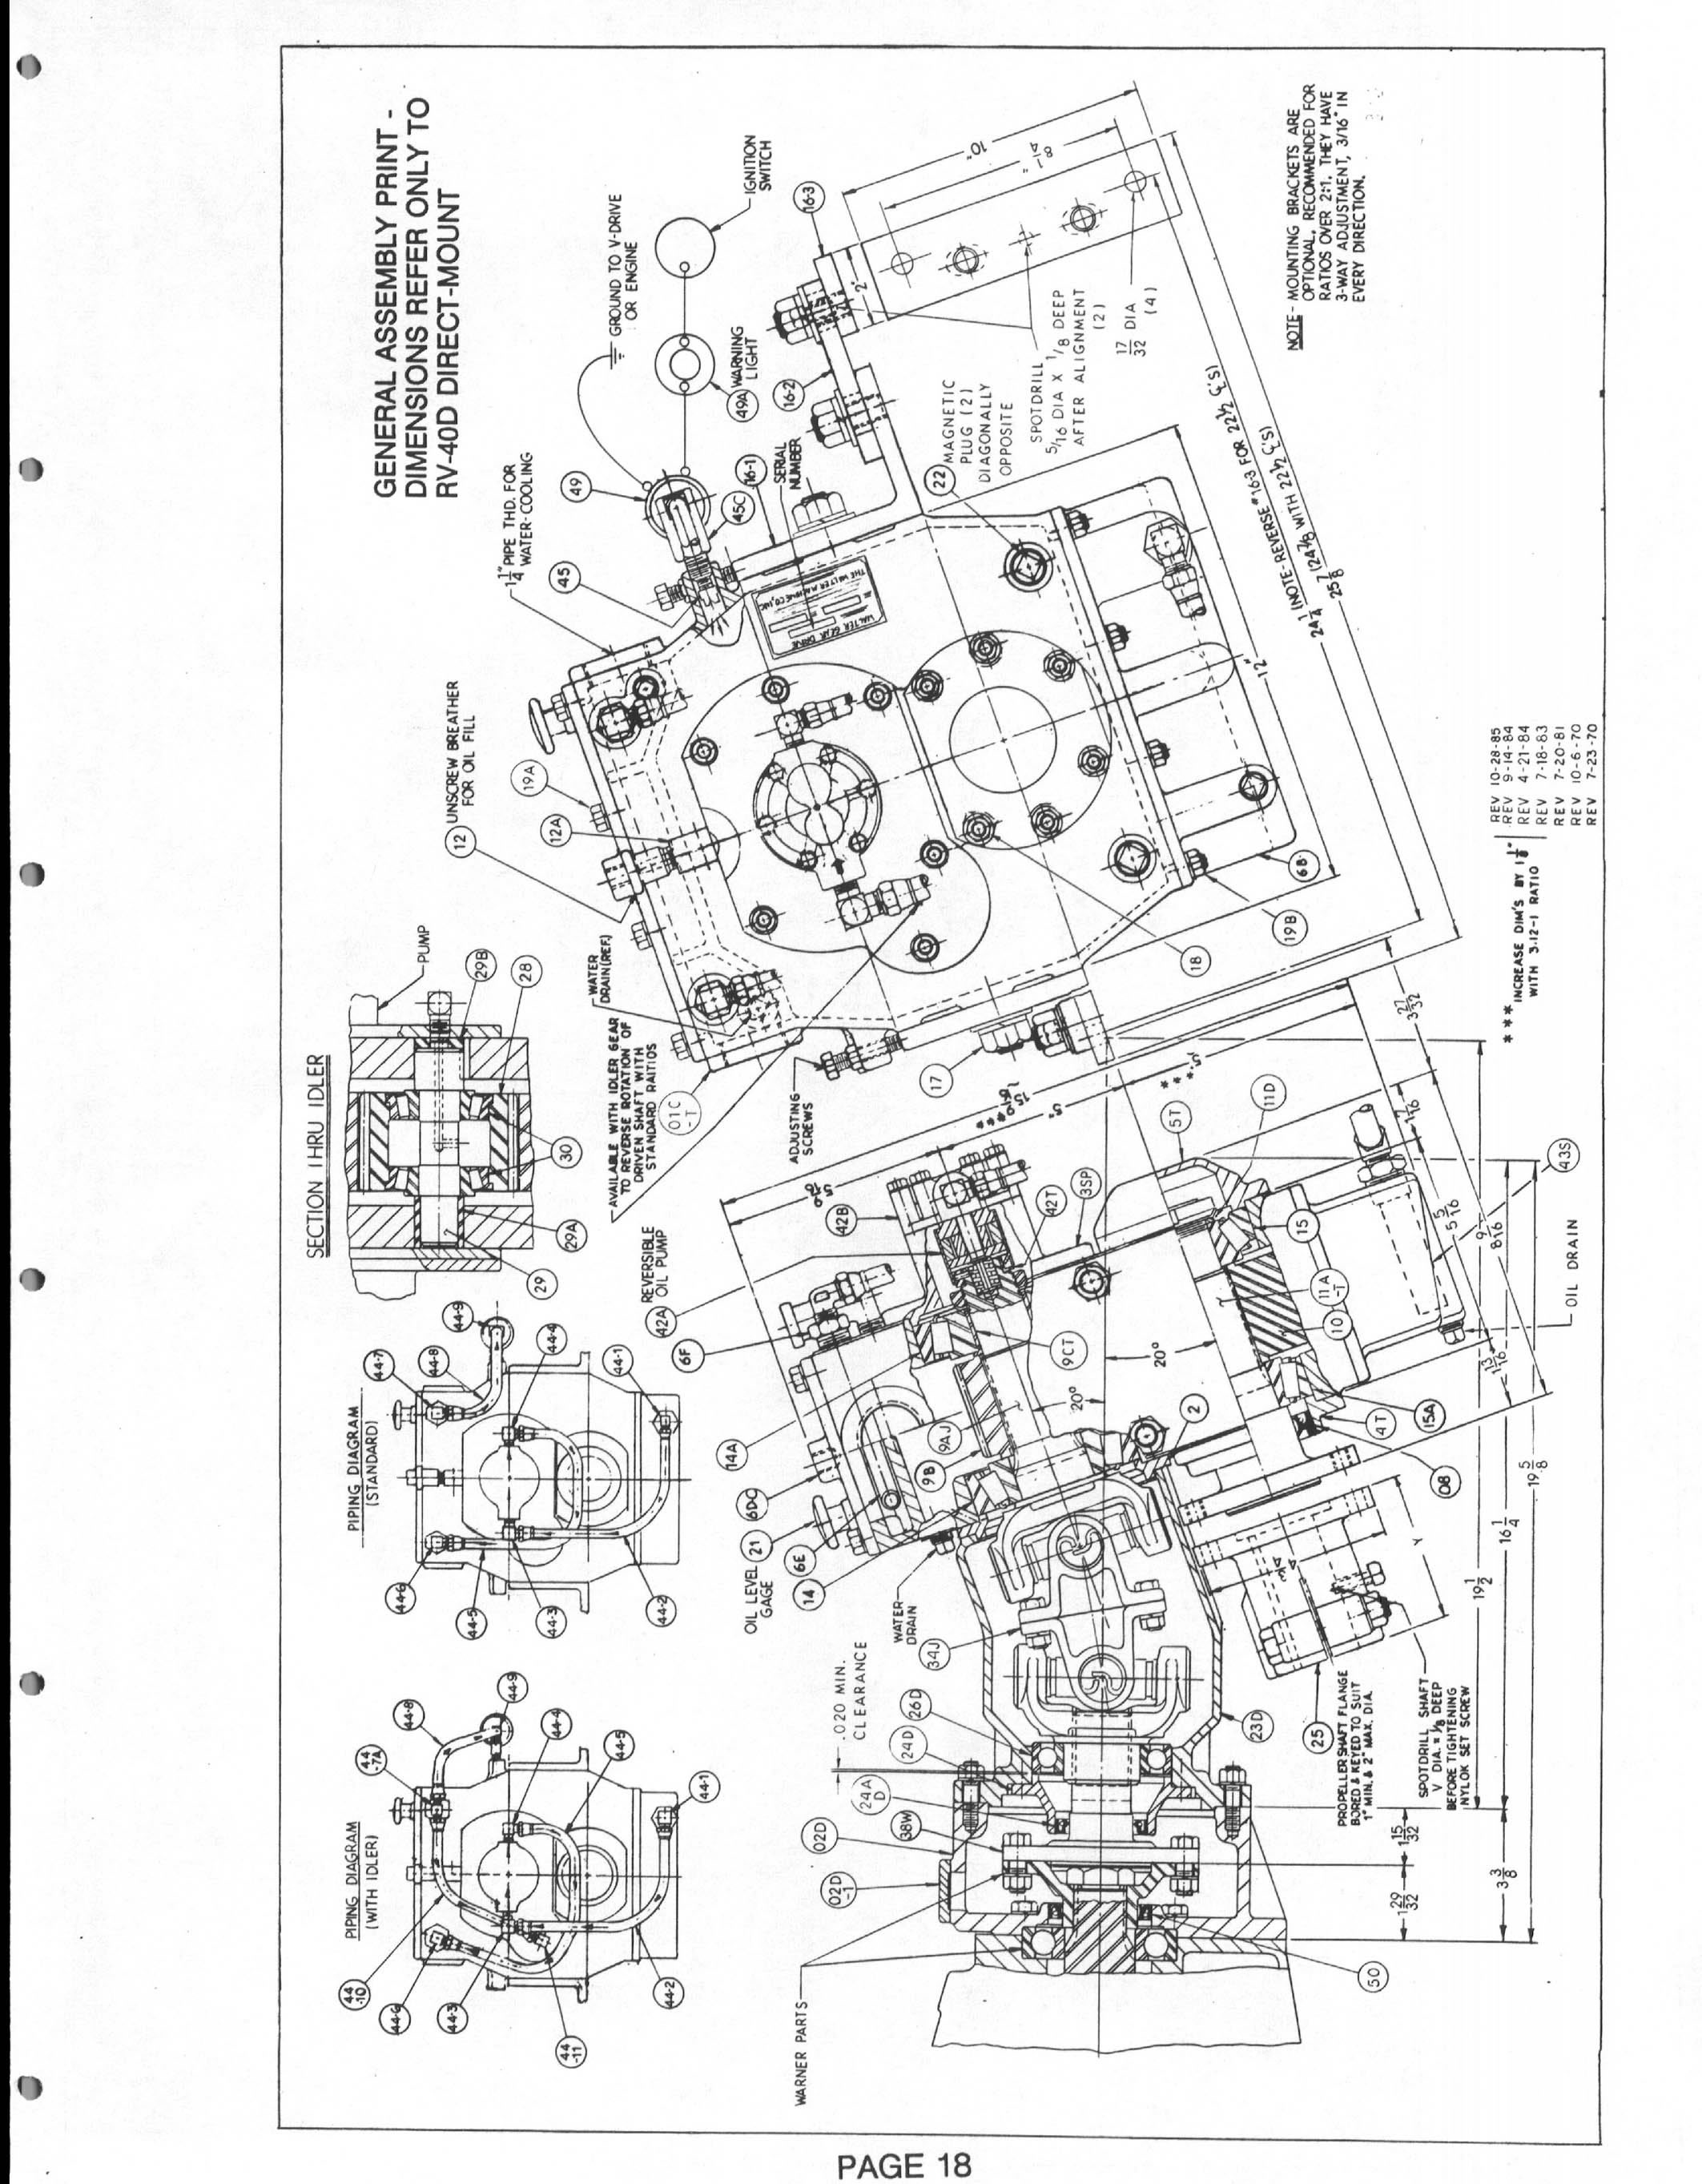 V Drive Manual / Page18.jpg